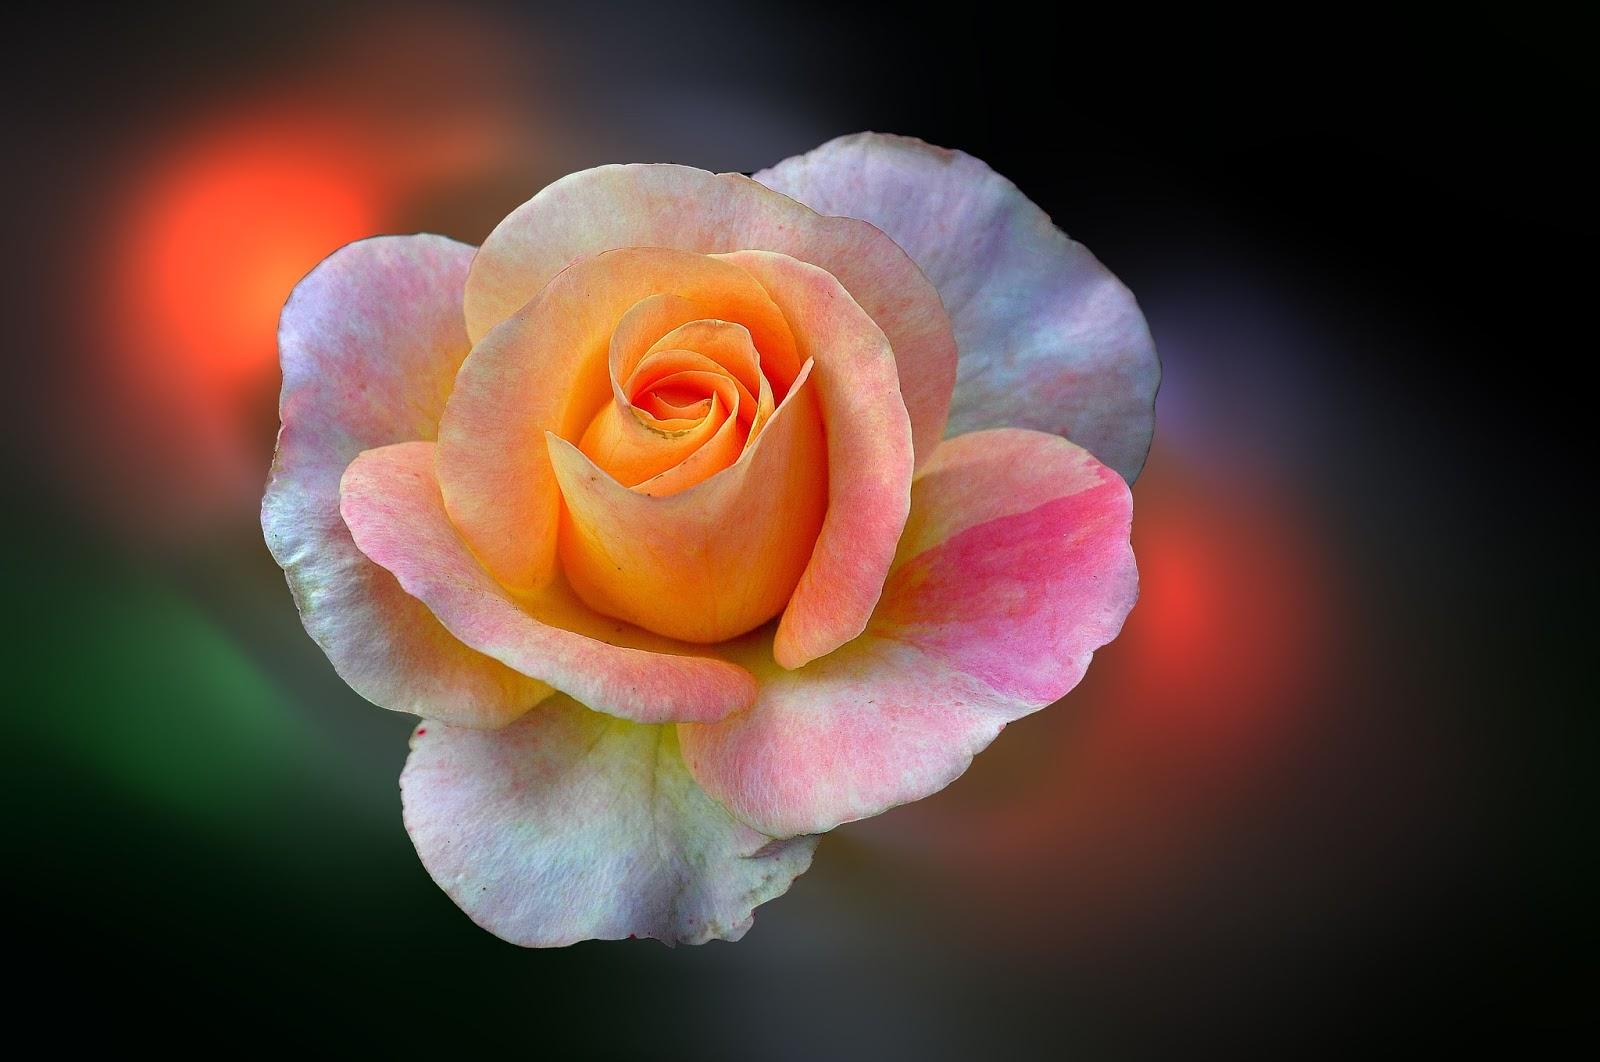 Fotos De Flores Alta Resolucion - Descarga foto gratis de flores de colores en alta resolución